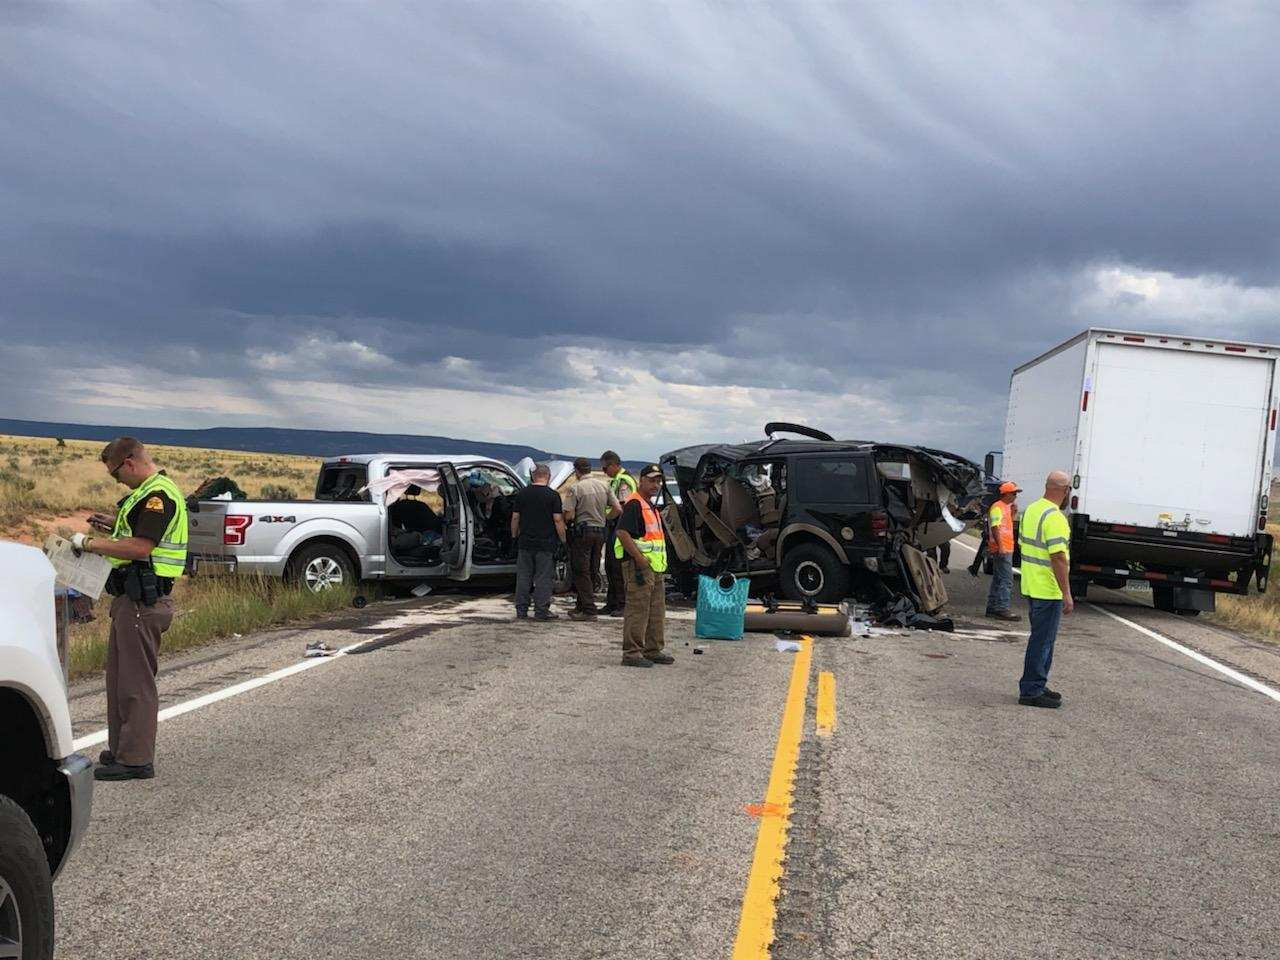 Three killed in head-on crash in southern Utah - Deseret News